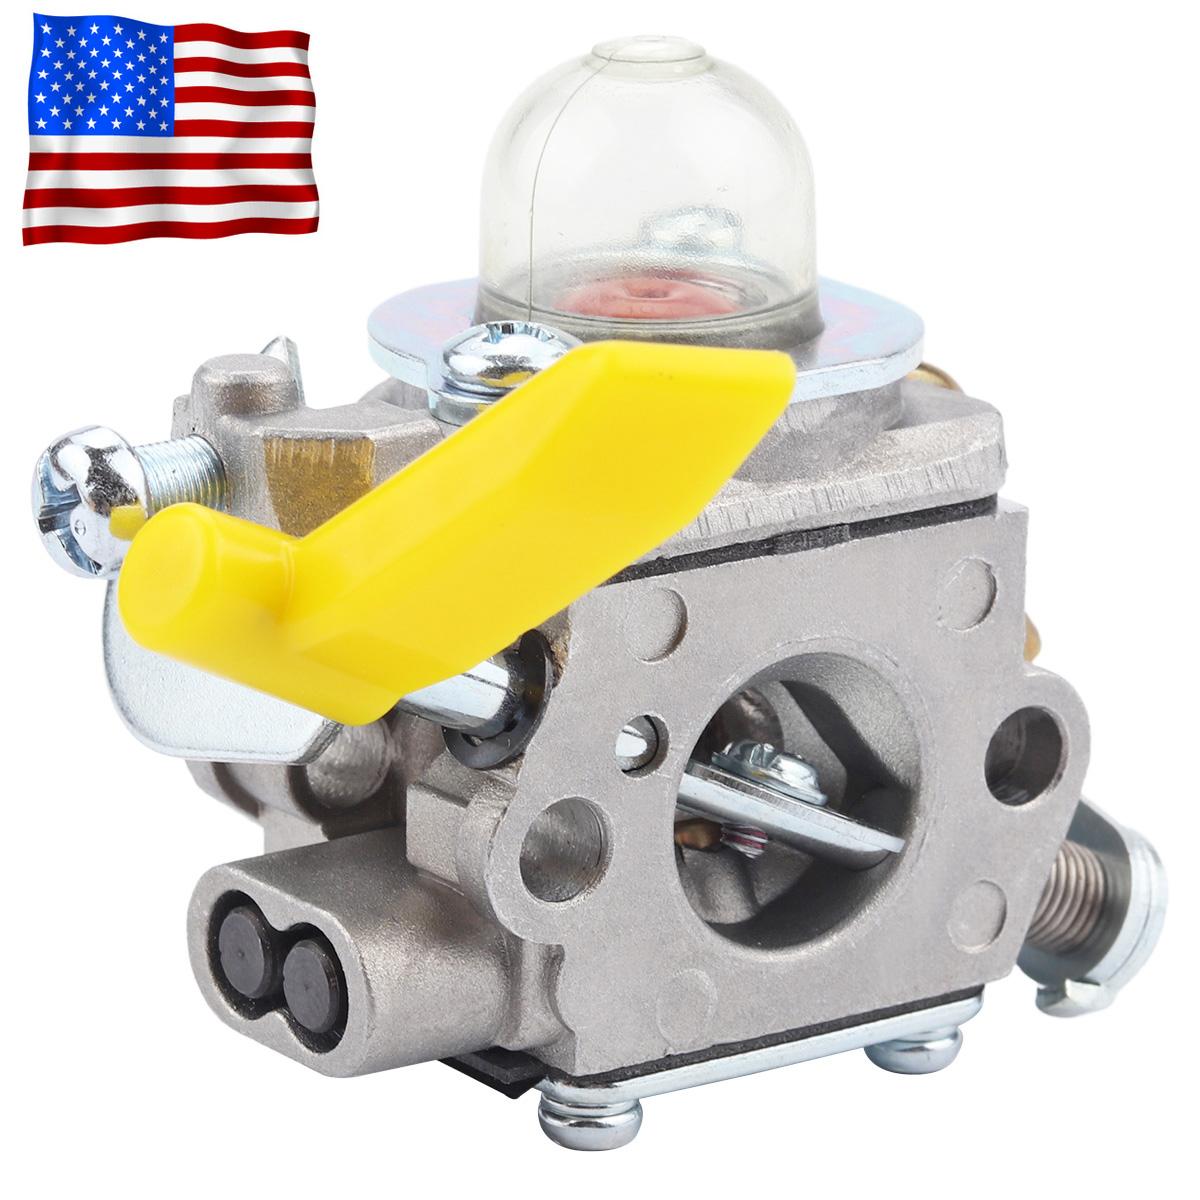 Carburetor Fit For RYOBI RY52003 CS30 SS30 BC30 RY30002B RY30002 RY26500 26cc